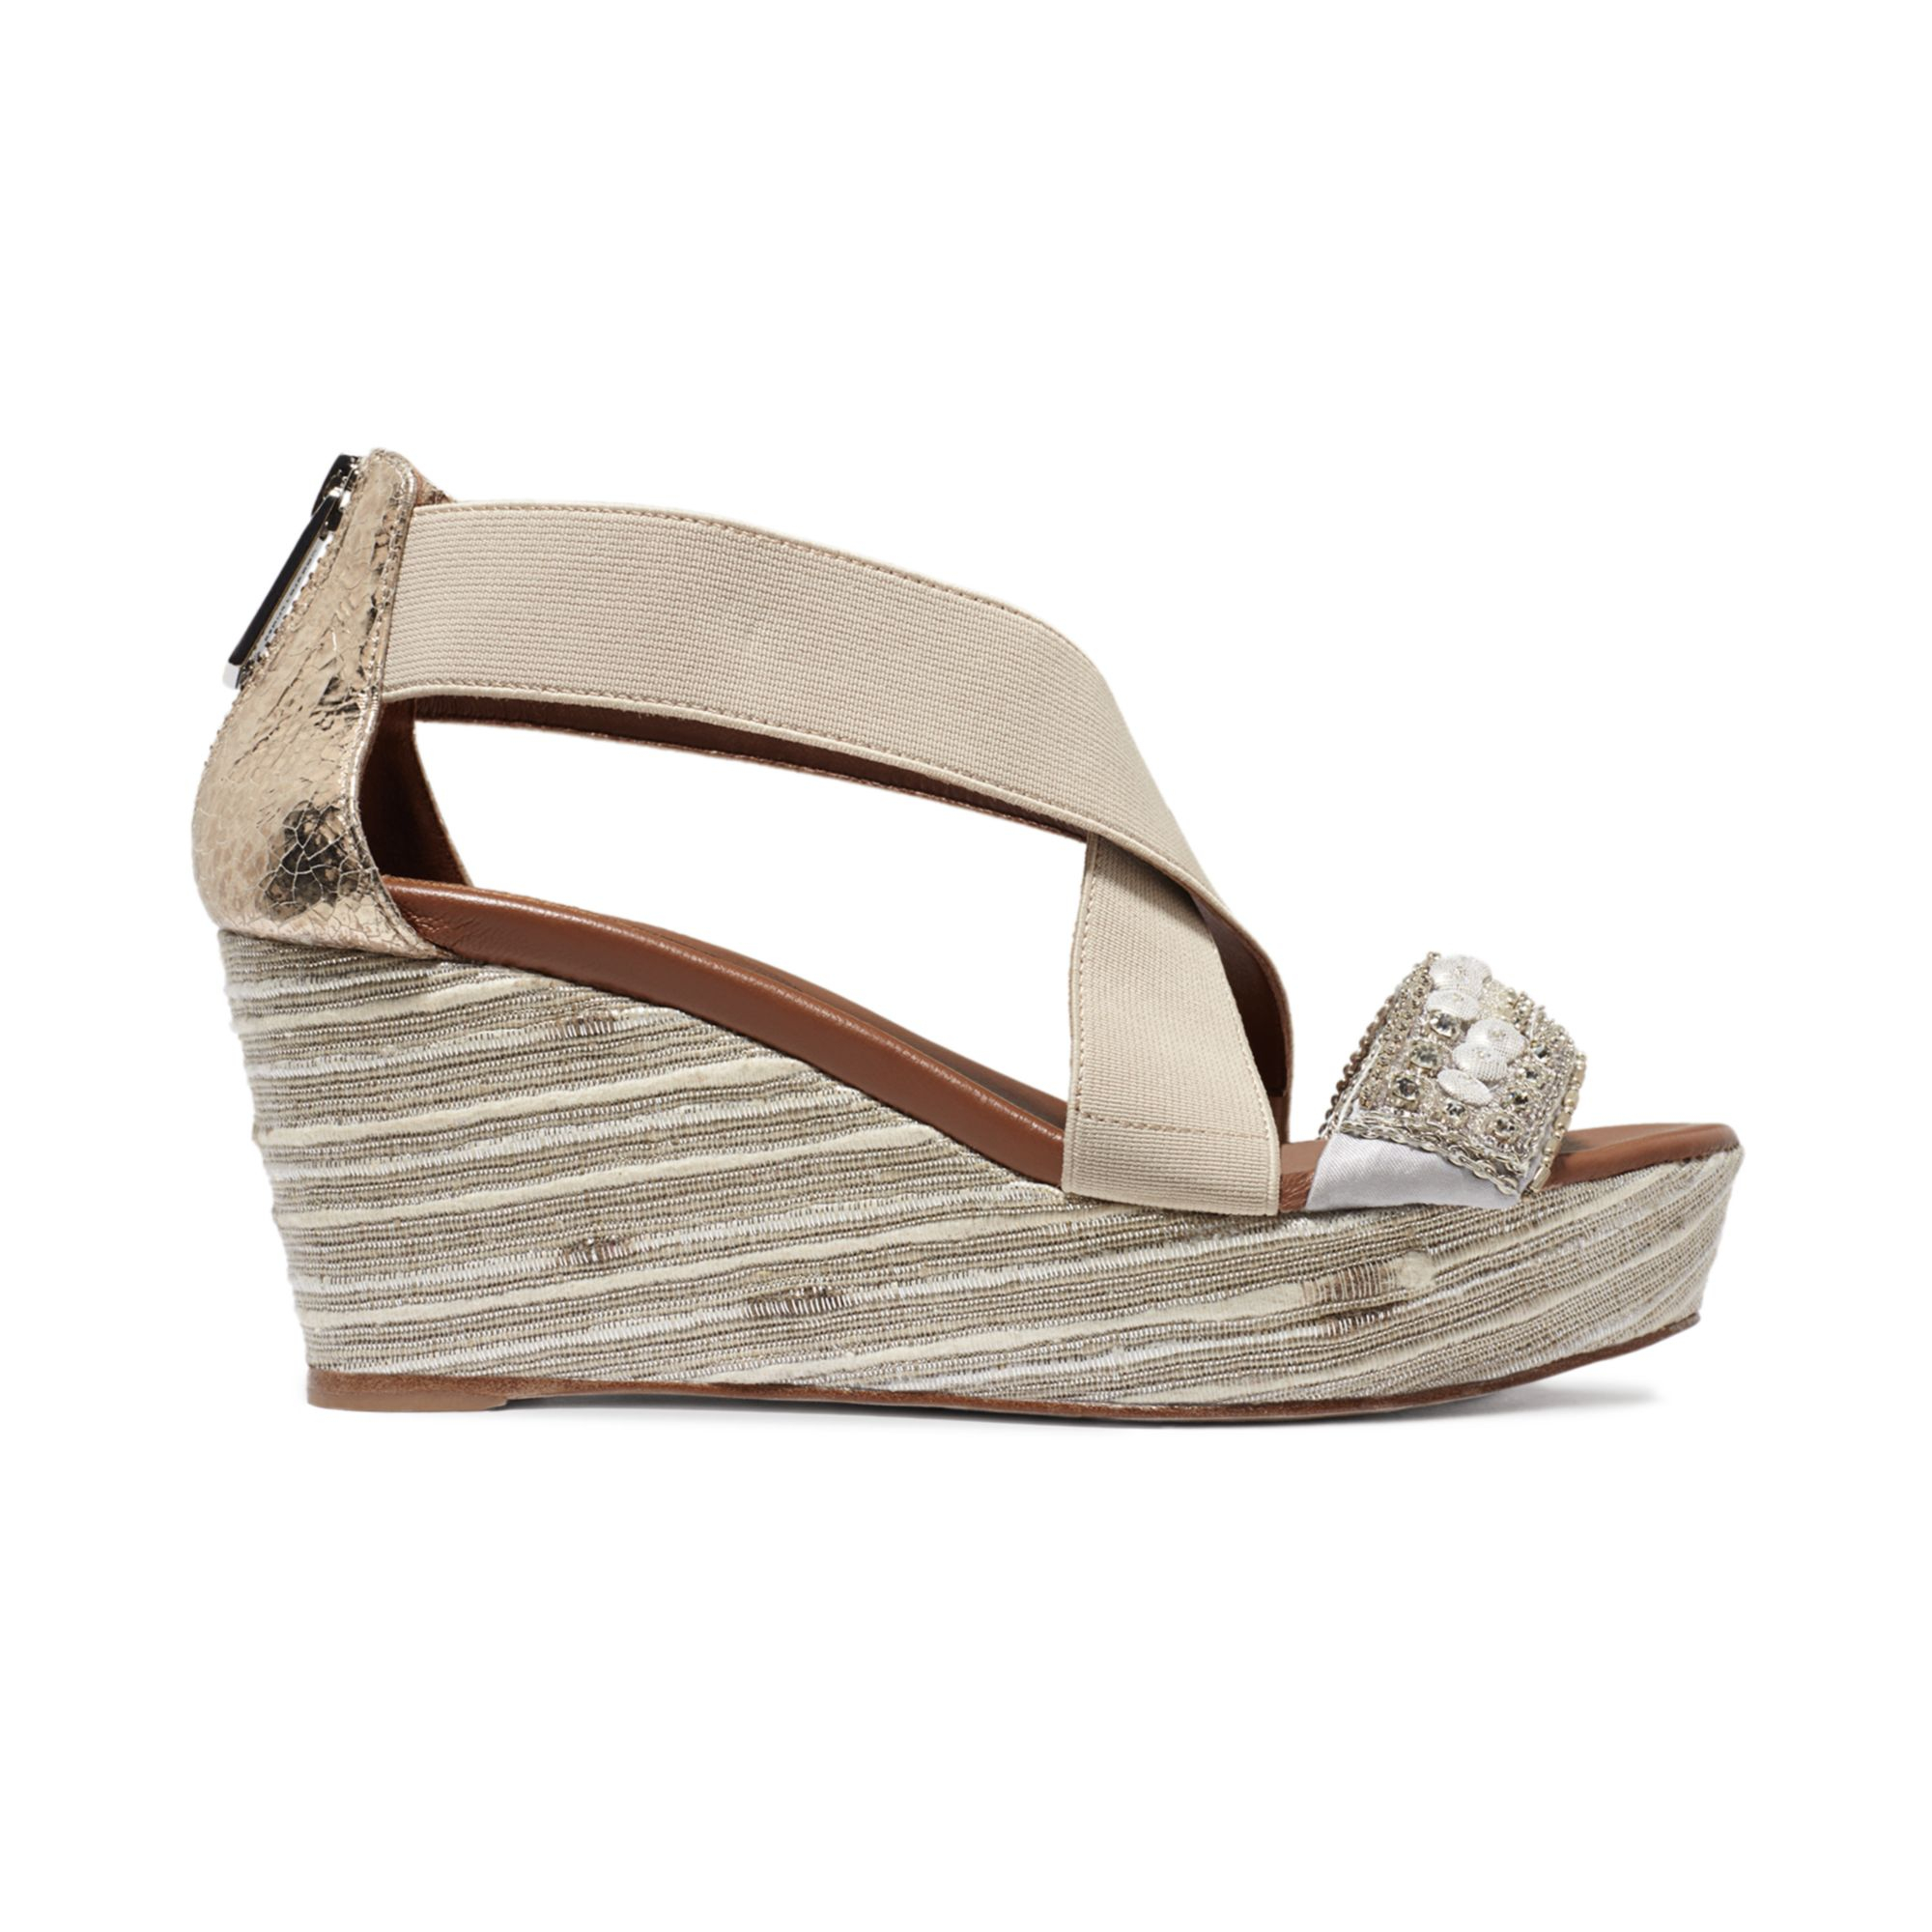 David Pliner Womens Shoes